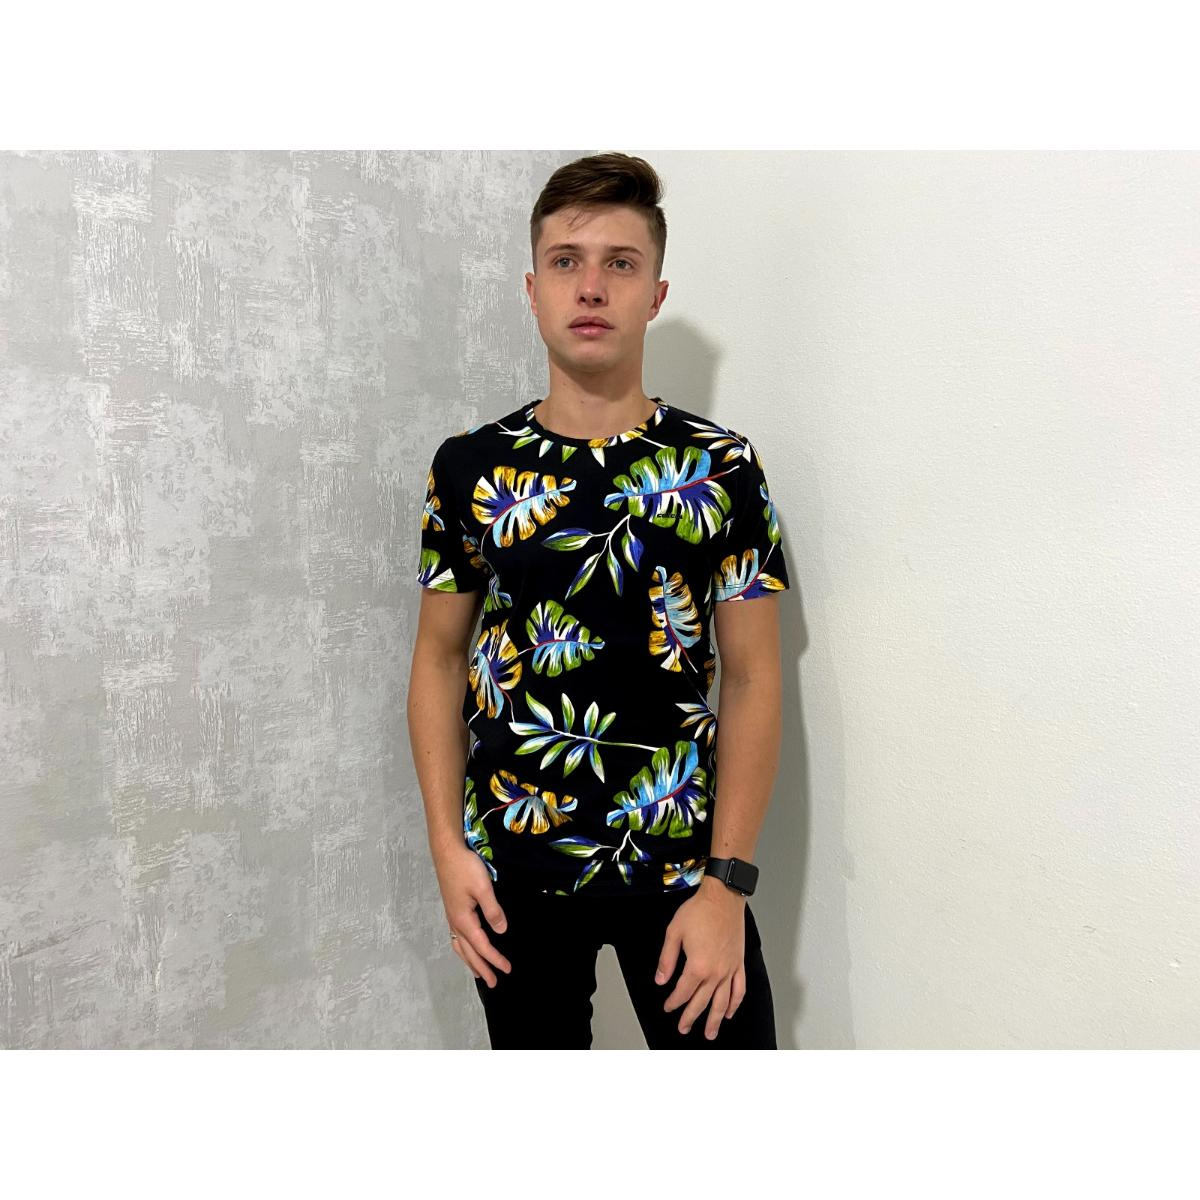 Camiseta Masculina Colcci 350108483 Vc67 Preto Floral